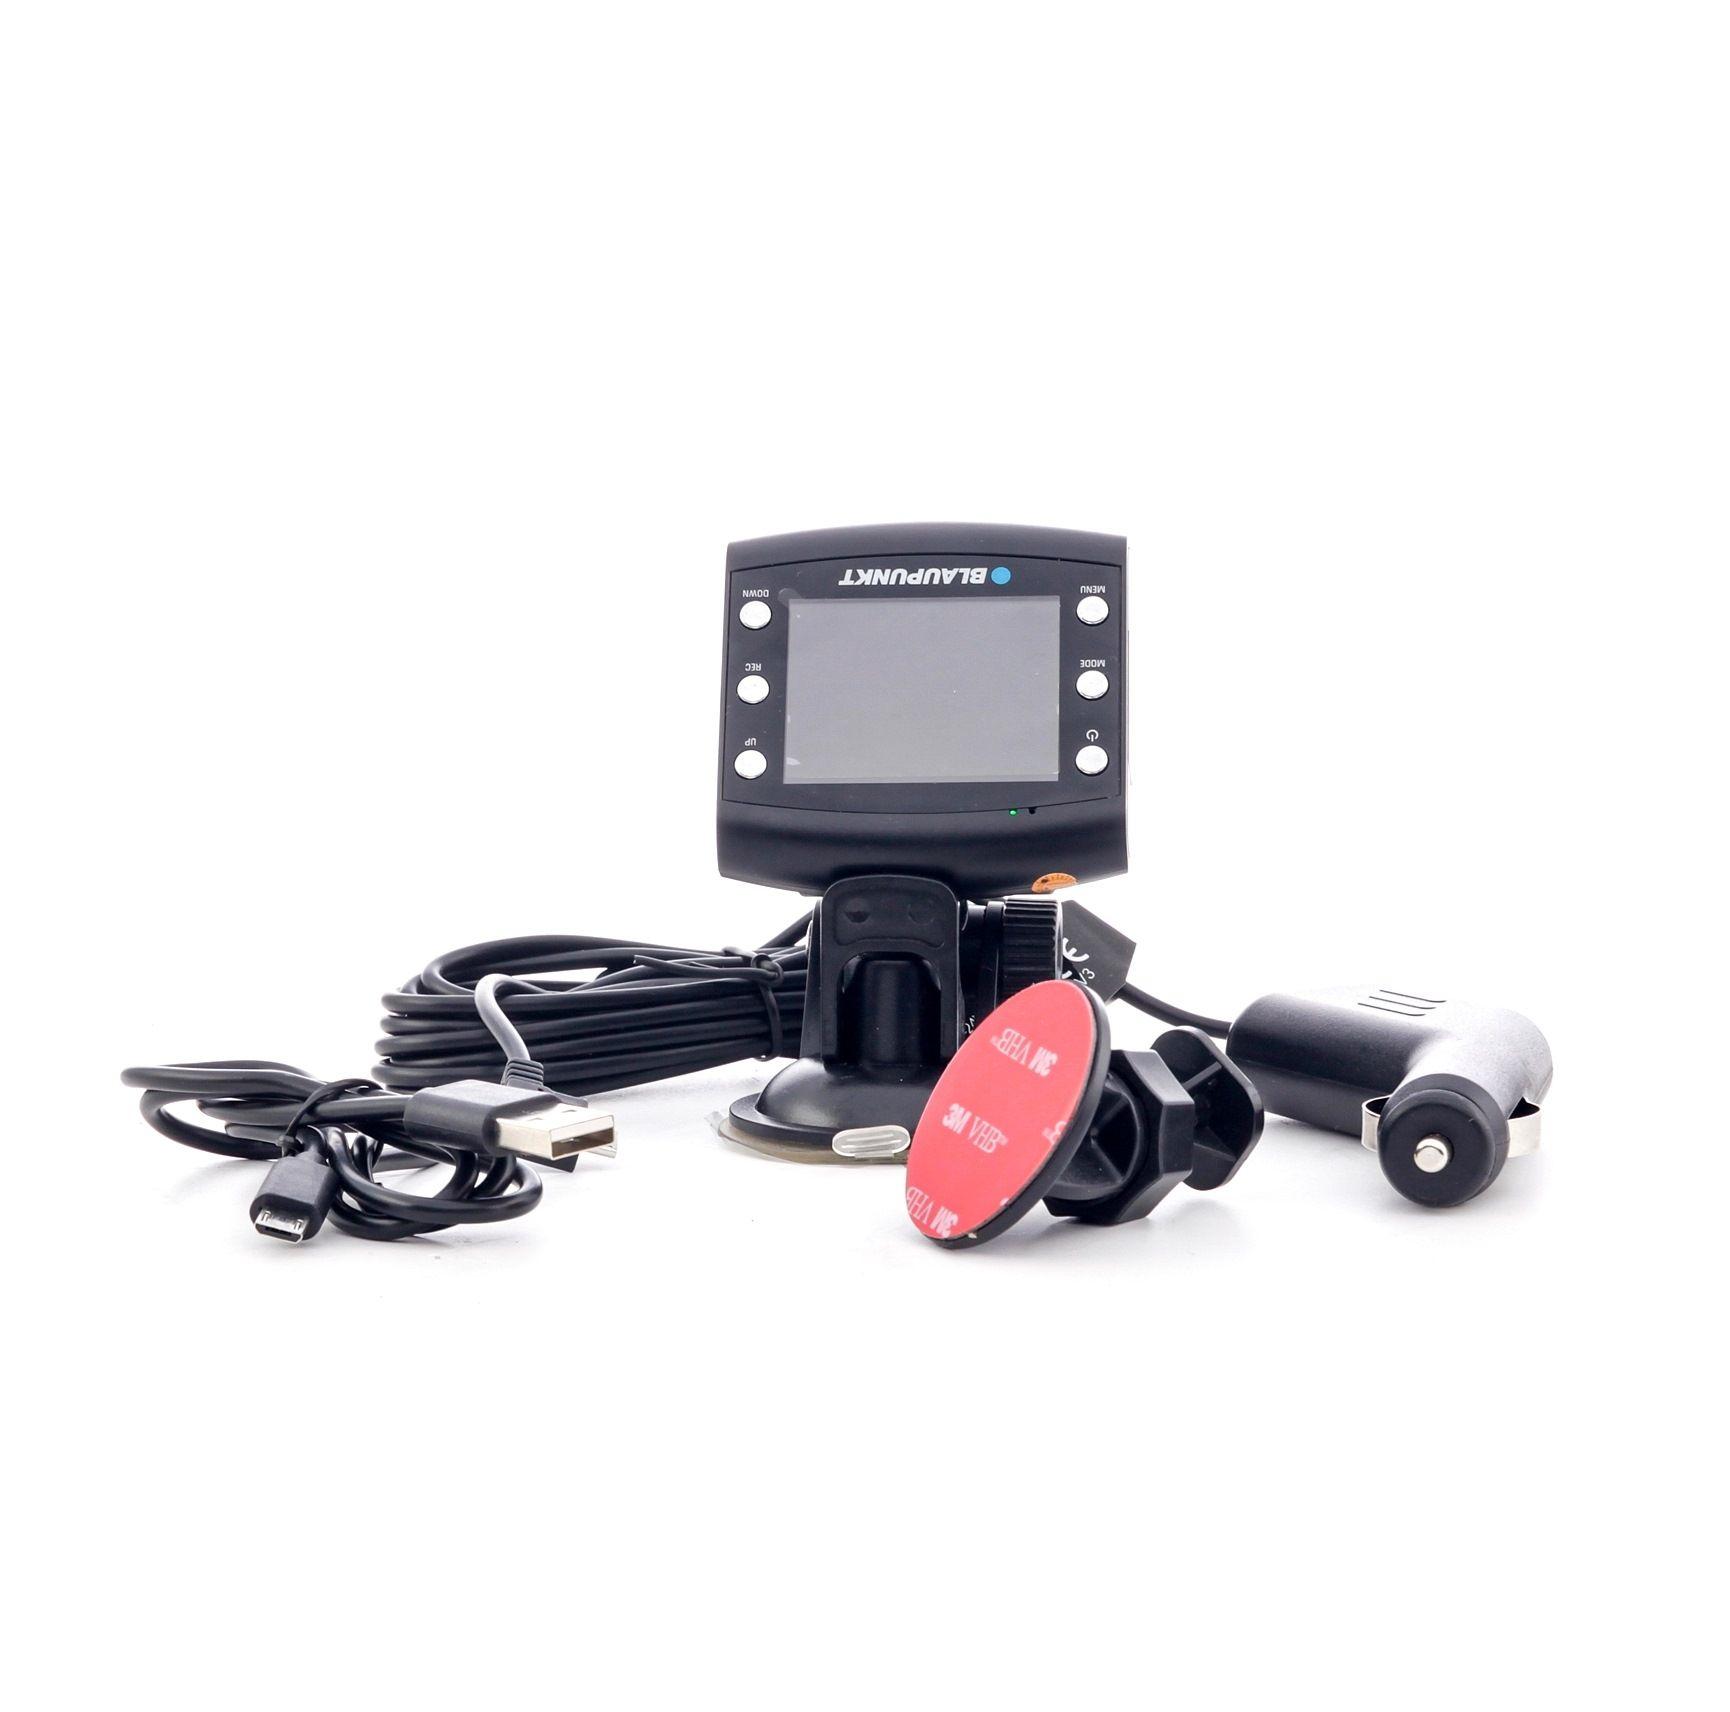 Dash cams BLAUPUNKT 2 005 017 000 001 rating